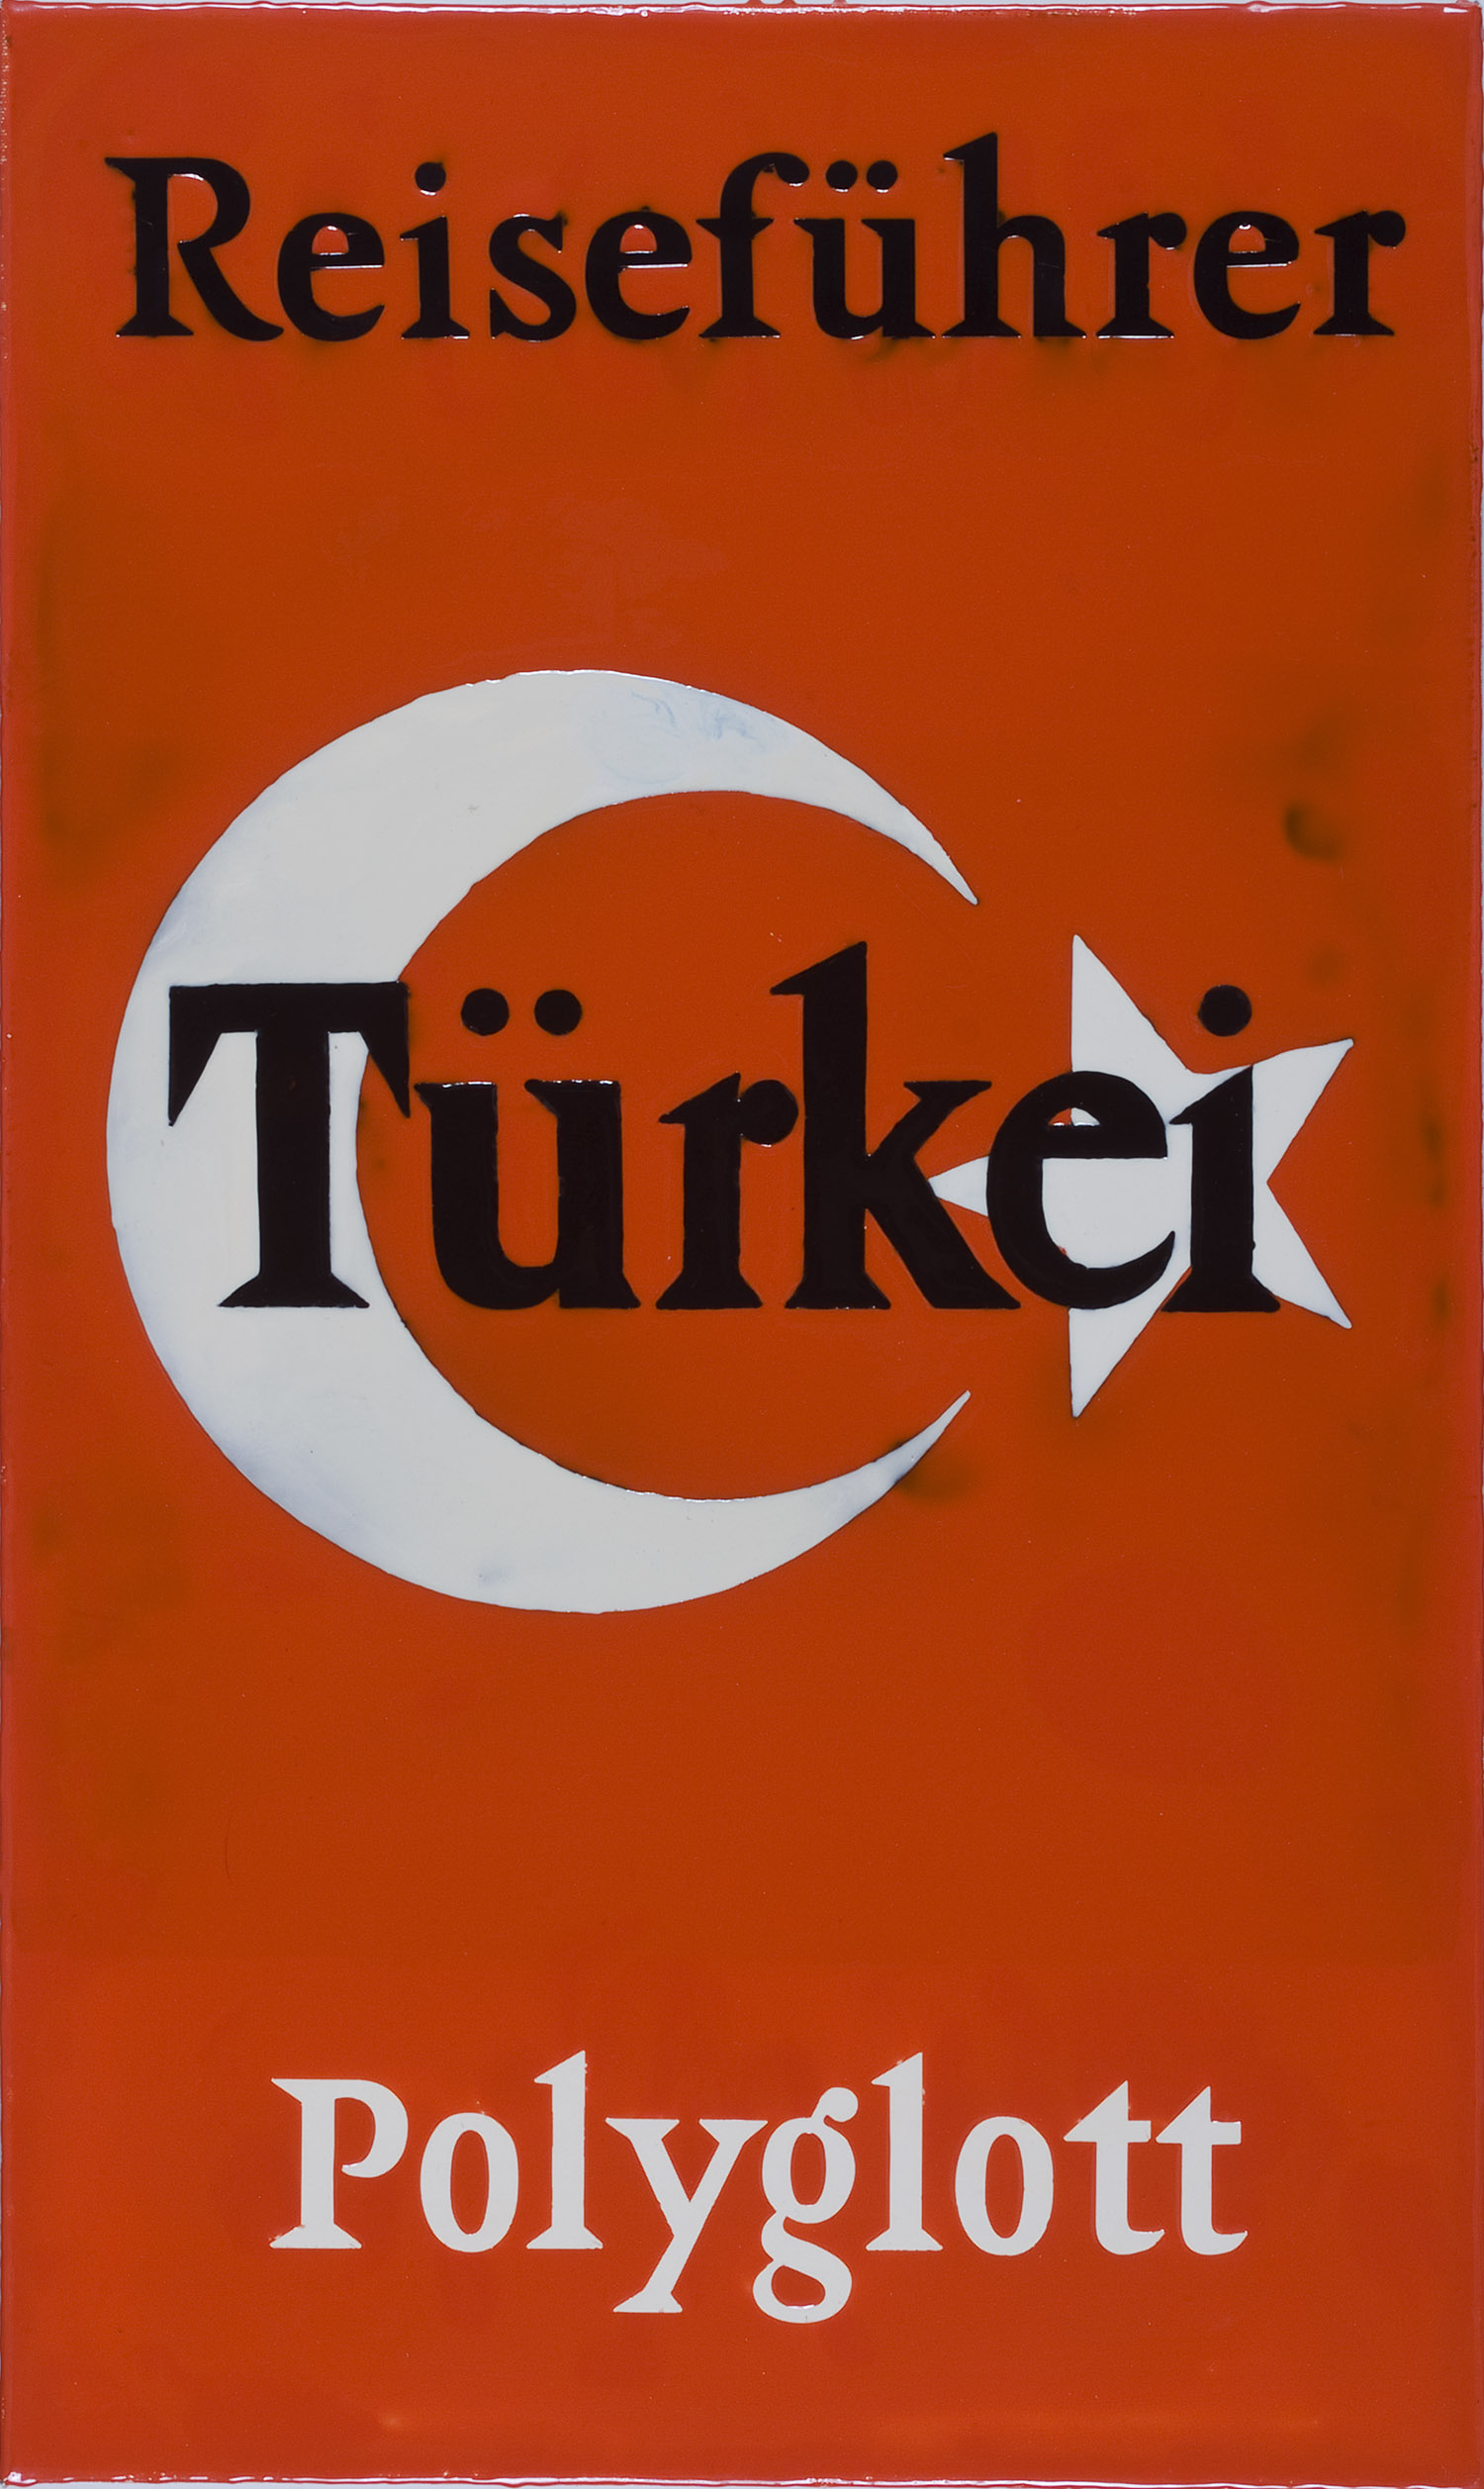 Reiseführer Türkei | 1992 | Epoxydharz auf Leinwand | 80,5 x 48 cm